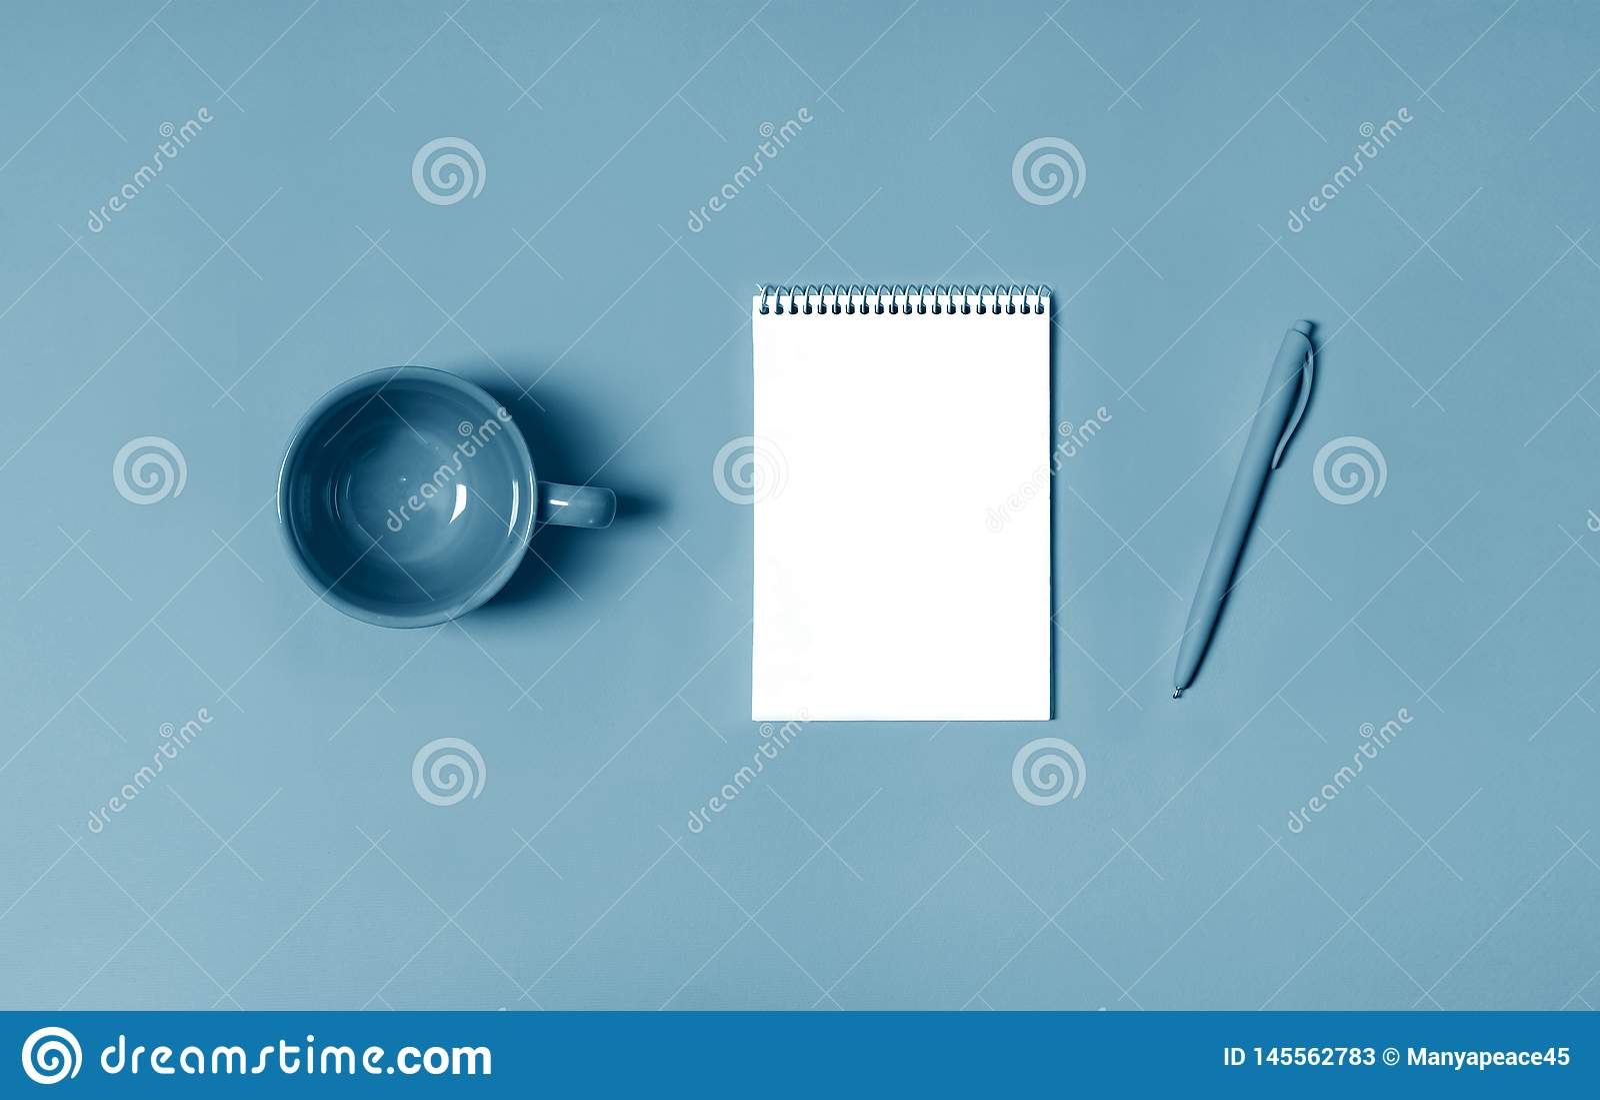 Flatlay, art minimalism style photographer stillife concept paper tablet pen design desktop idea inspiration